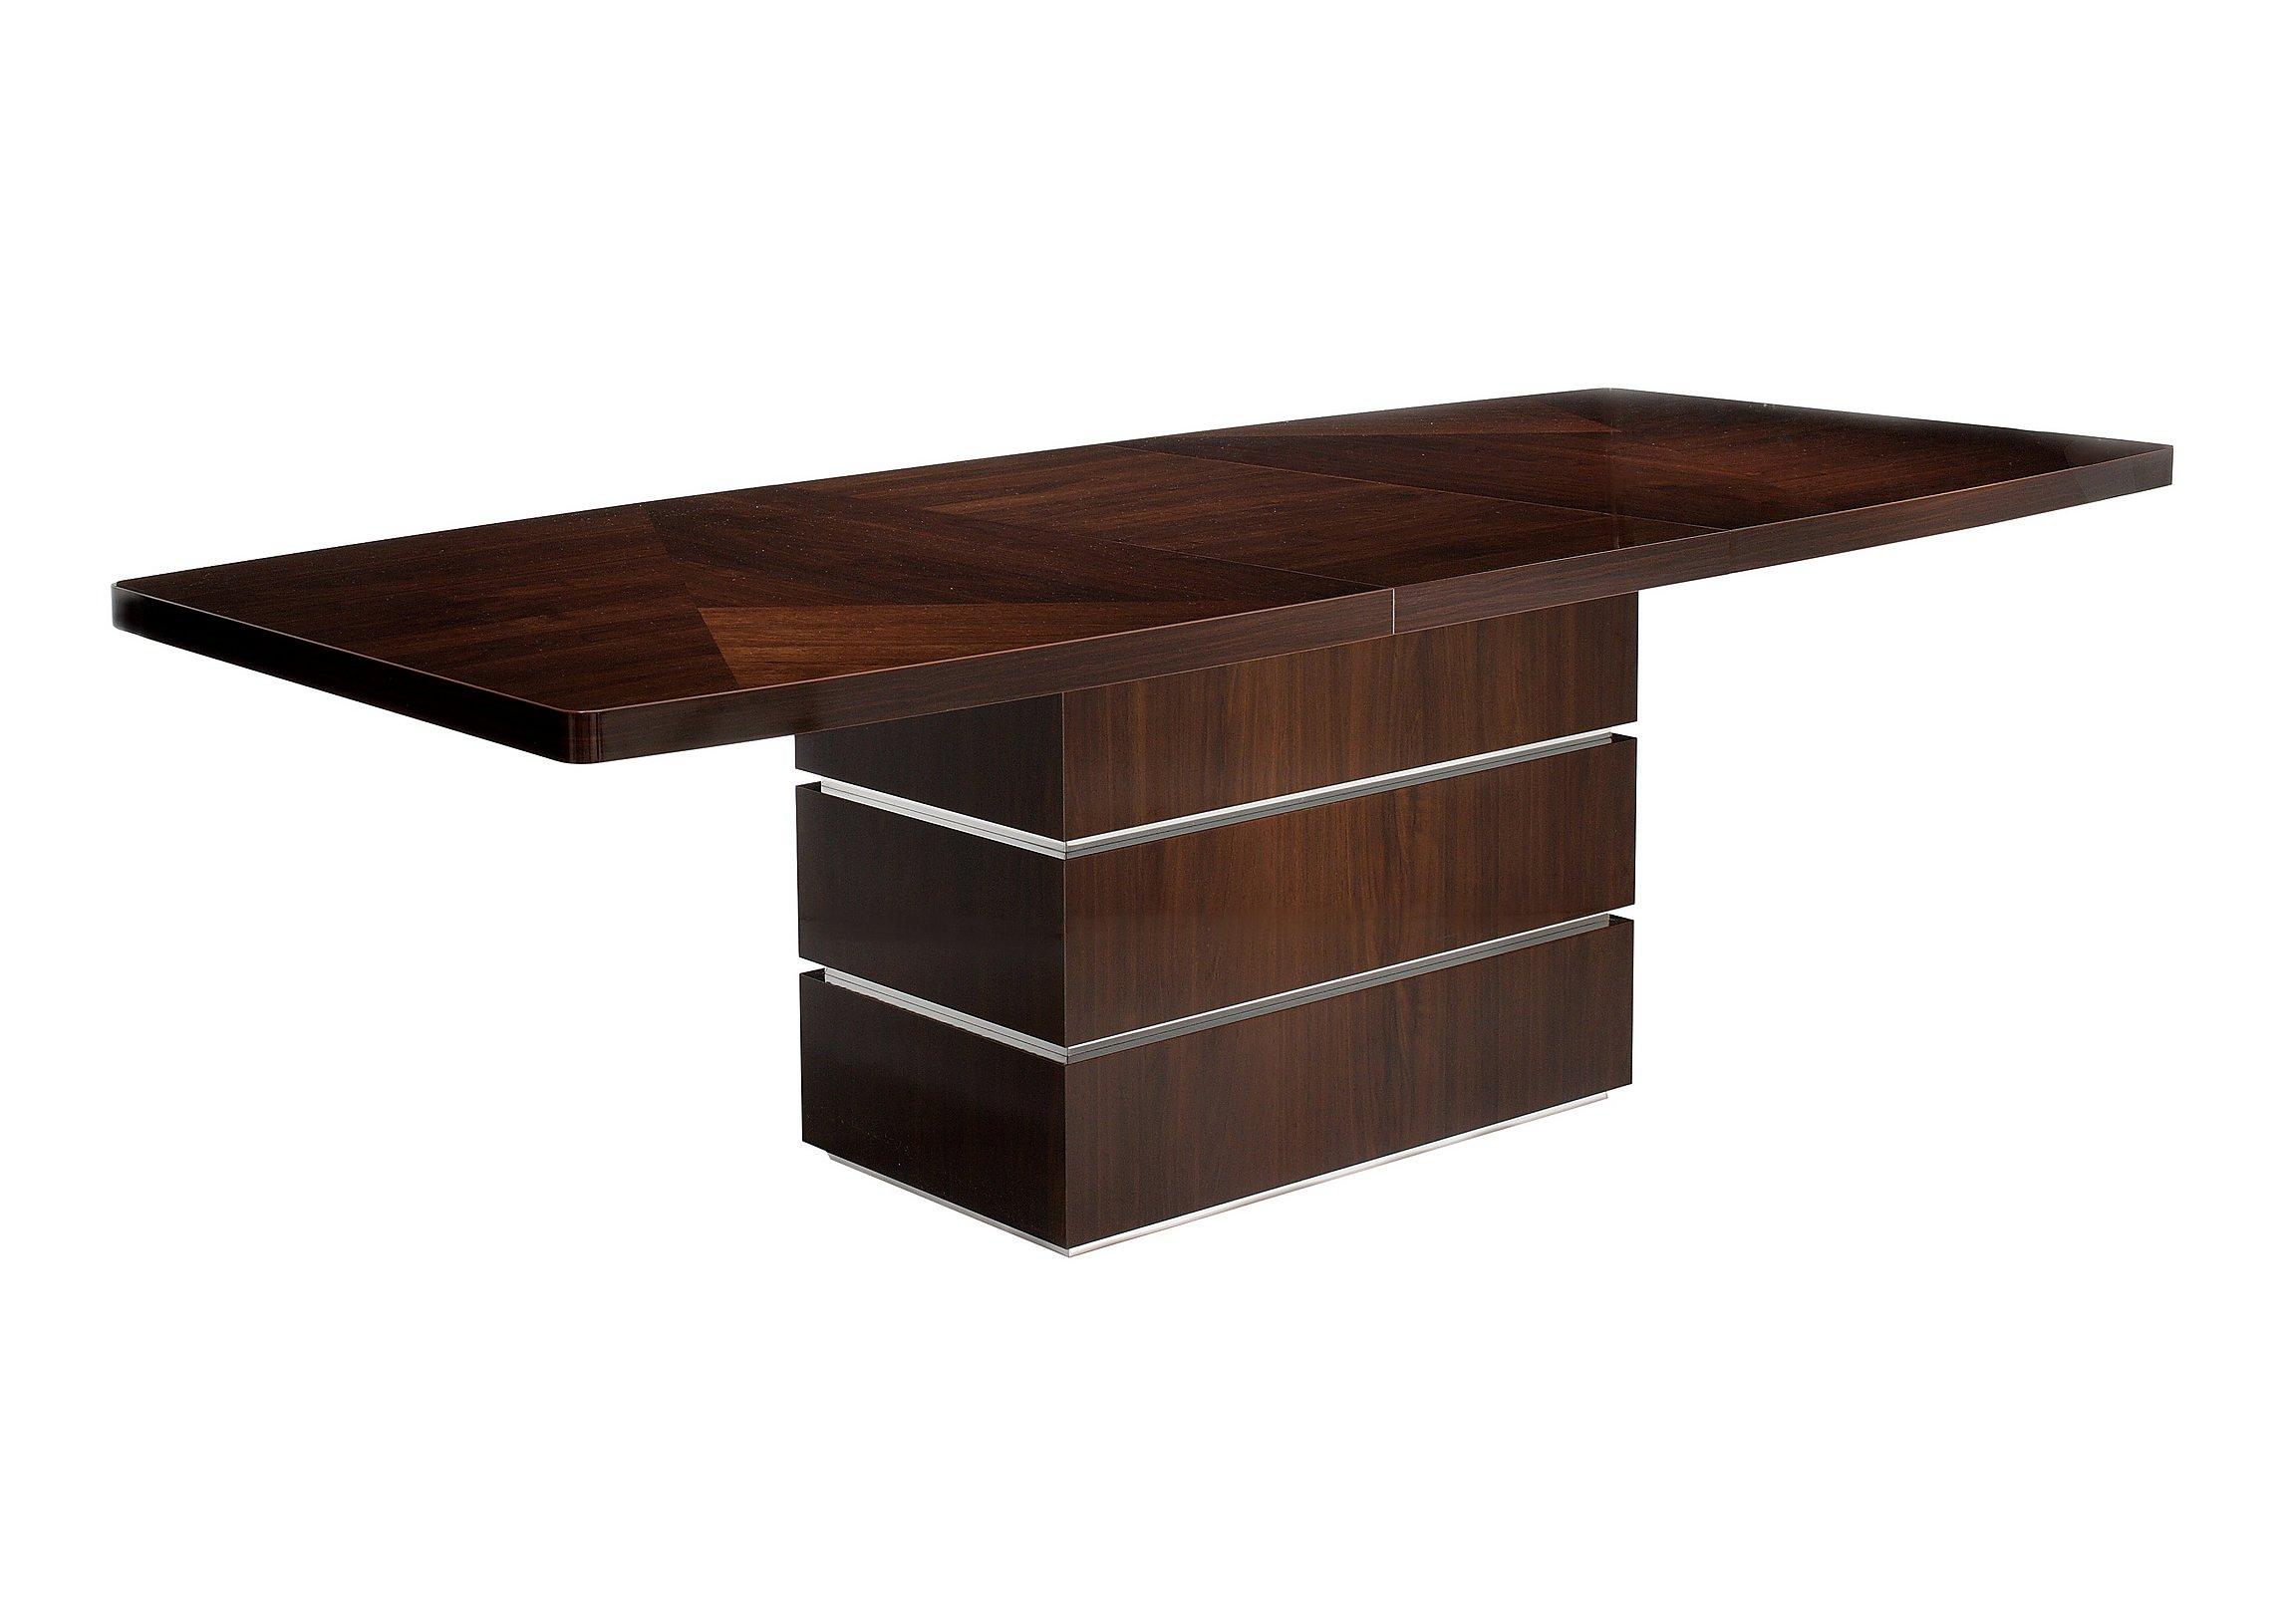 rossini extending dining table  alf  furniture village - alf rossini extending dining table